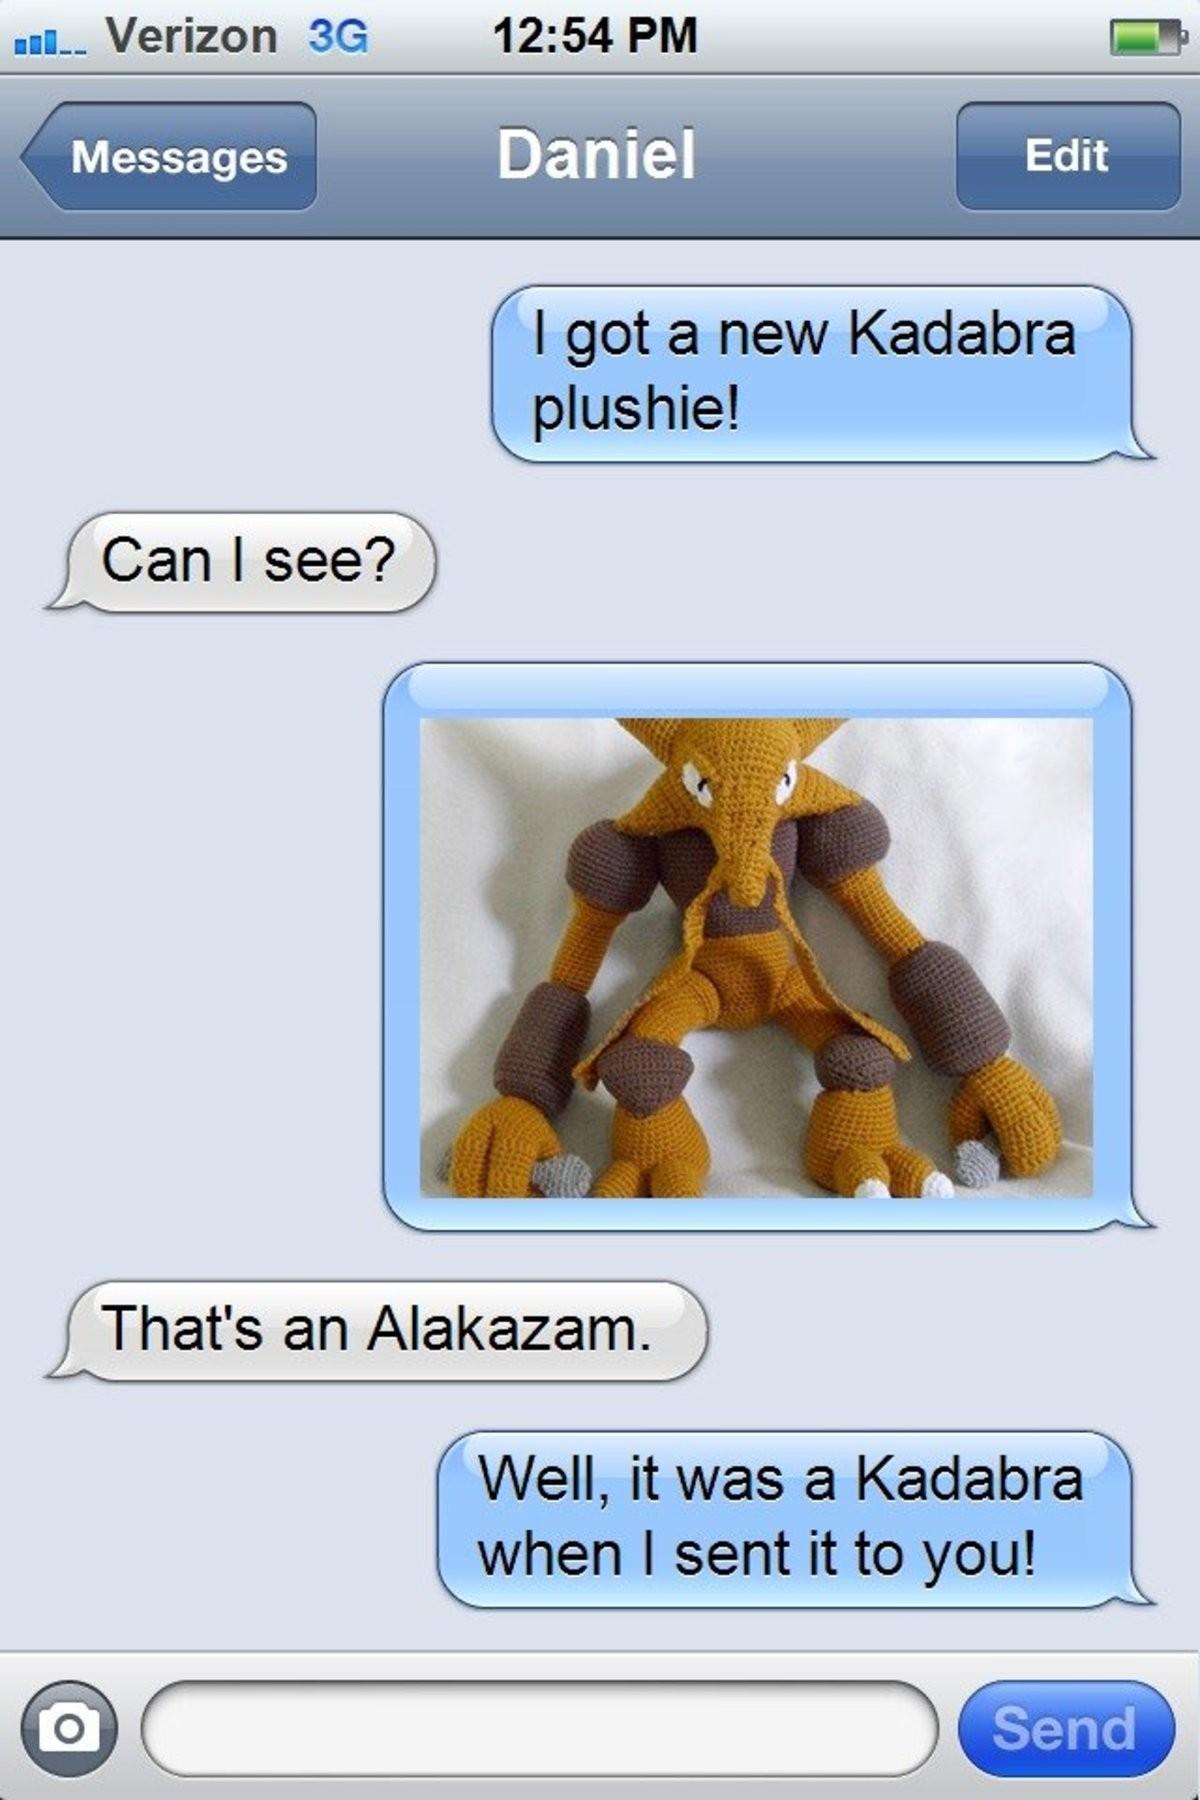 Kadabra plushie. .. Clever!